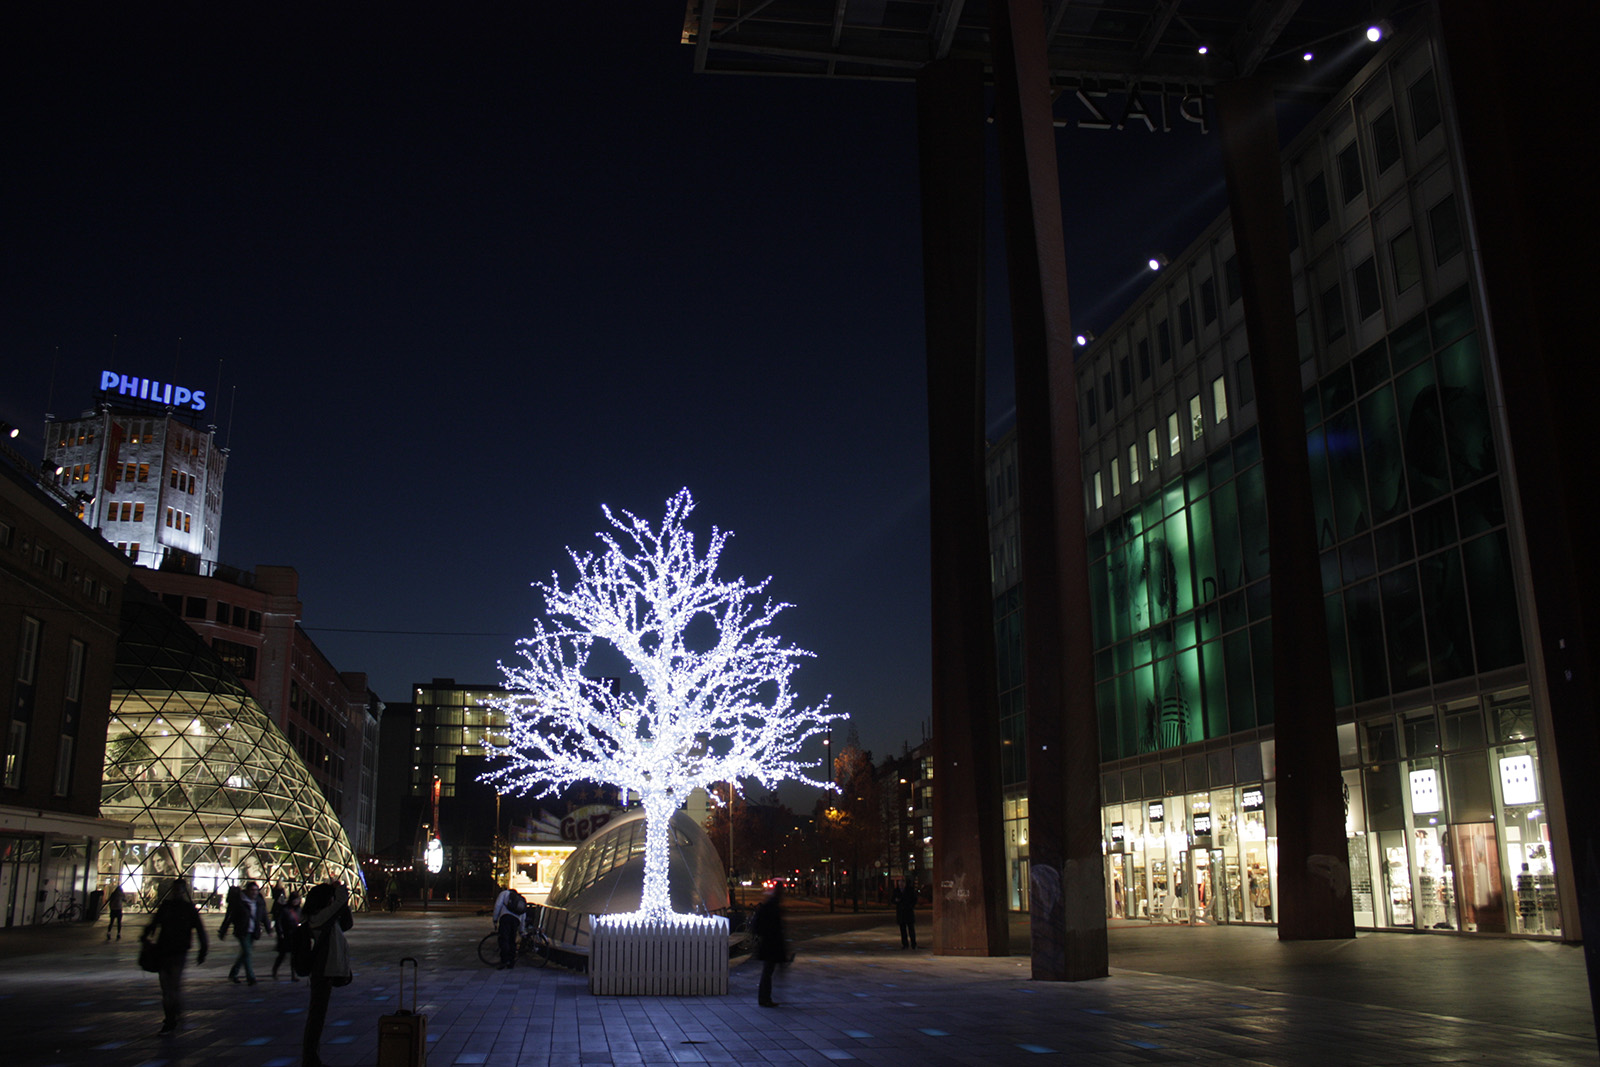 18 Septemberplein Eindhoven - Boom met licht bij Piazza